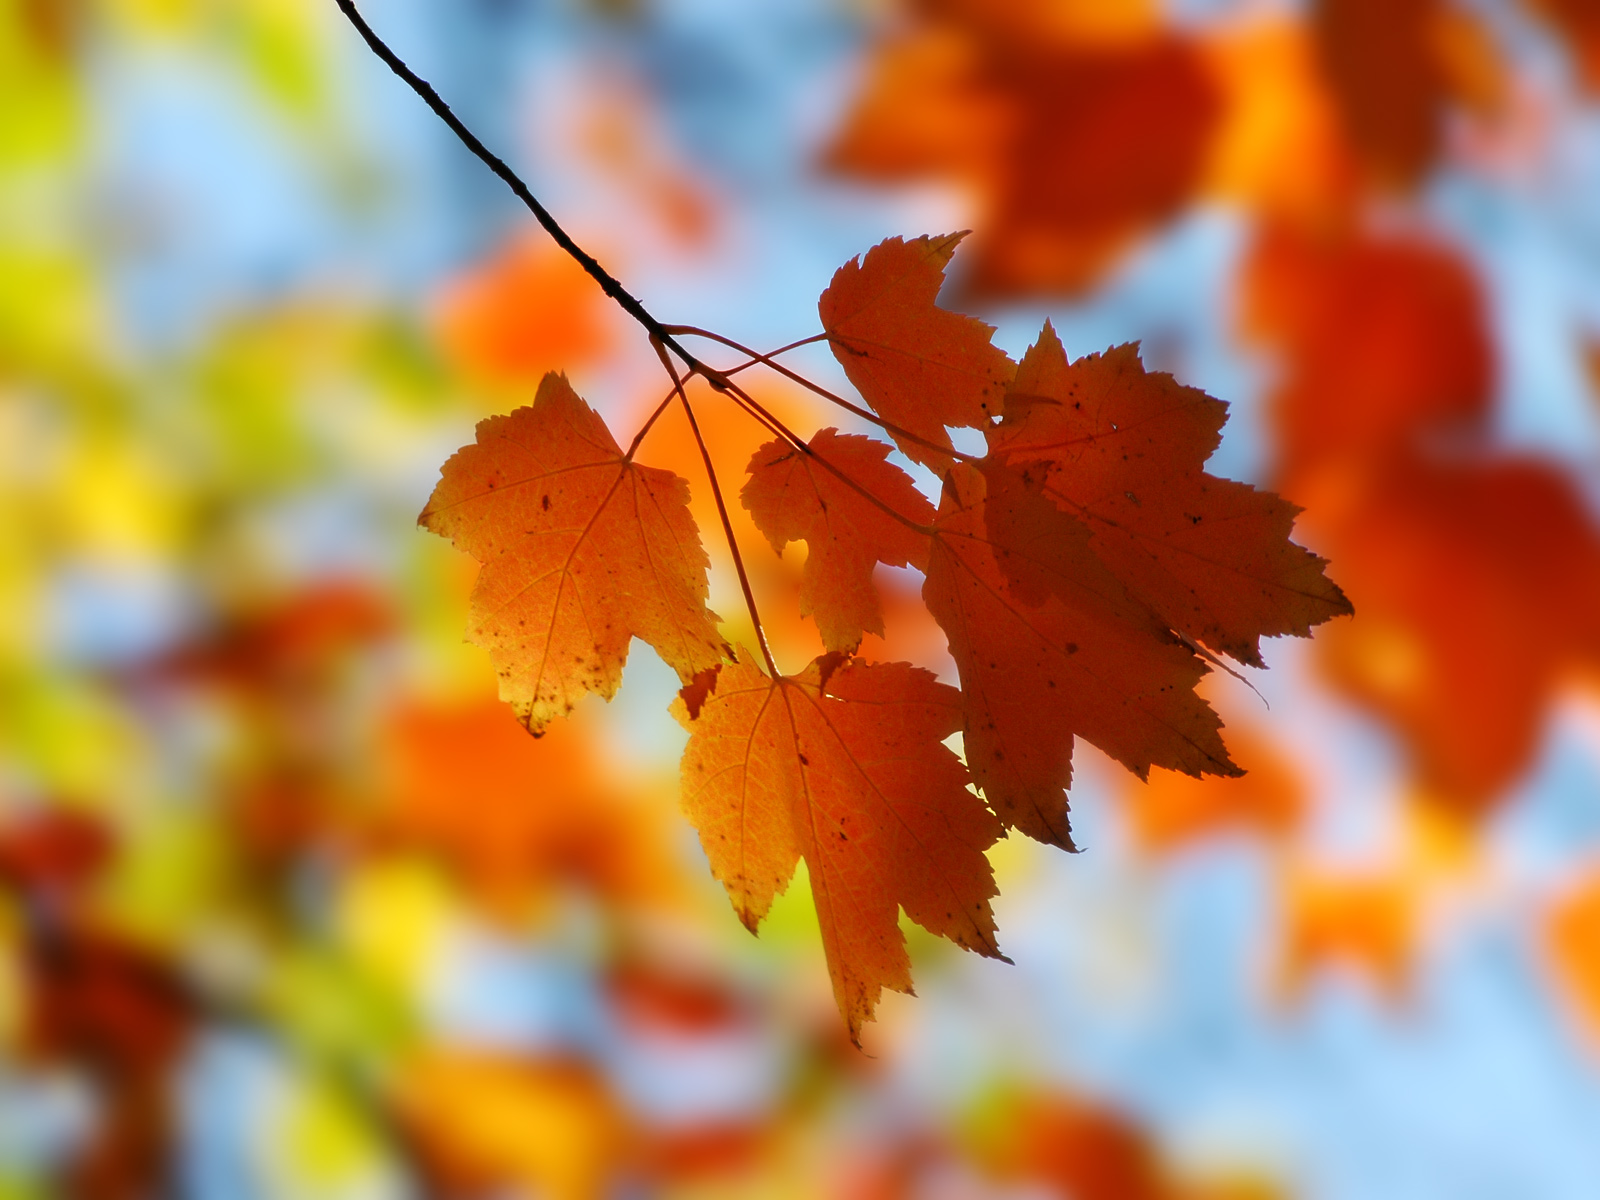 The best top autumn desktop wallpapers 21 En Güzel Sonbahar HD Duvar Kağıtları